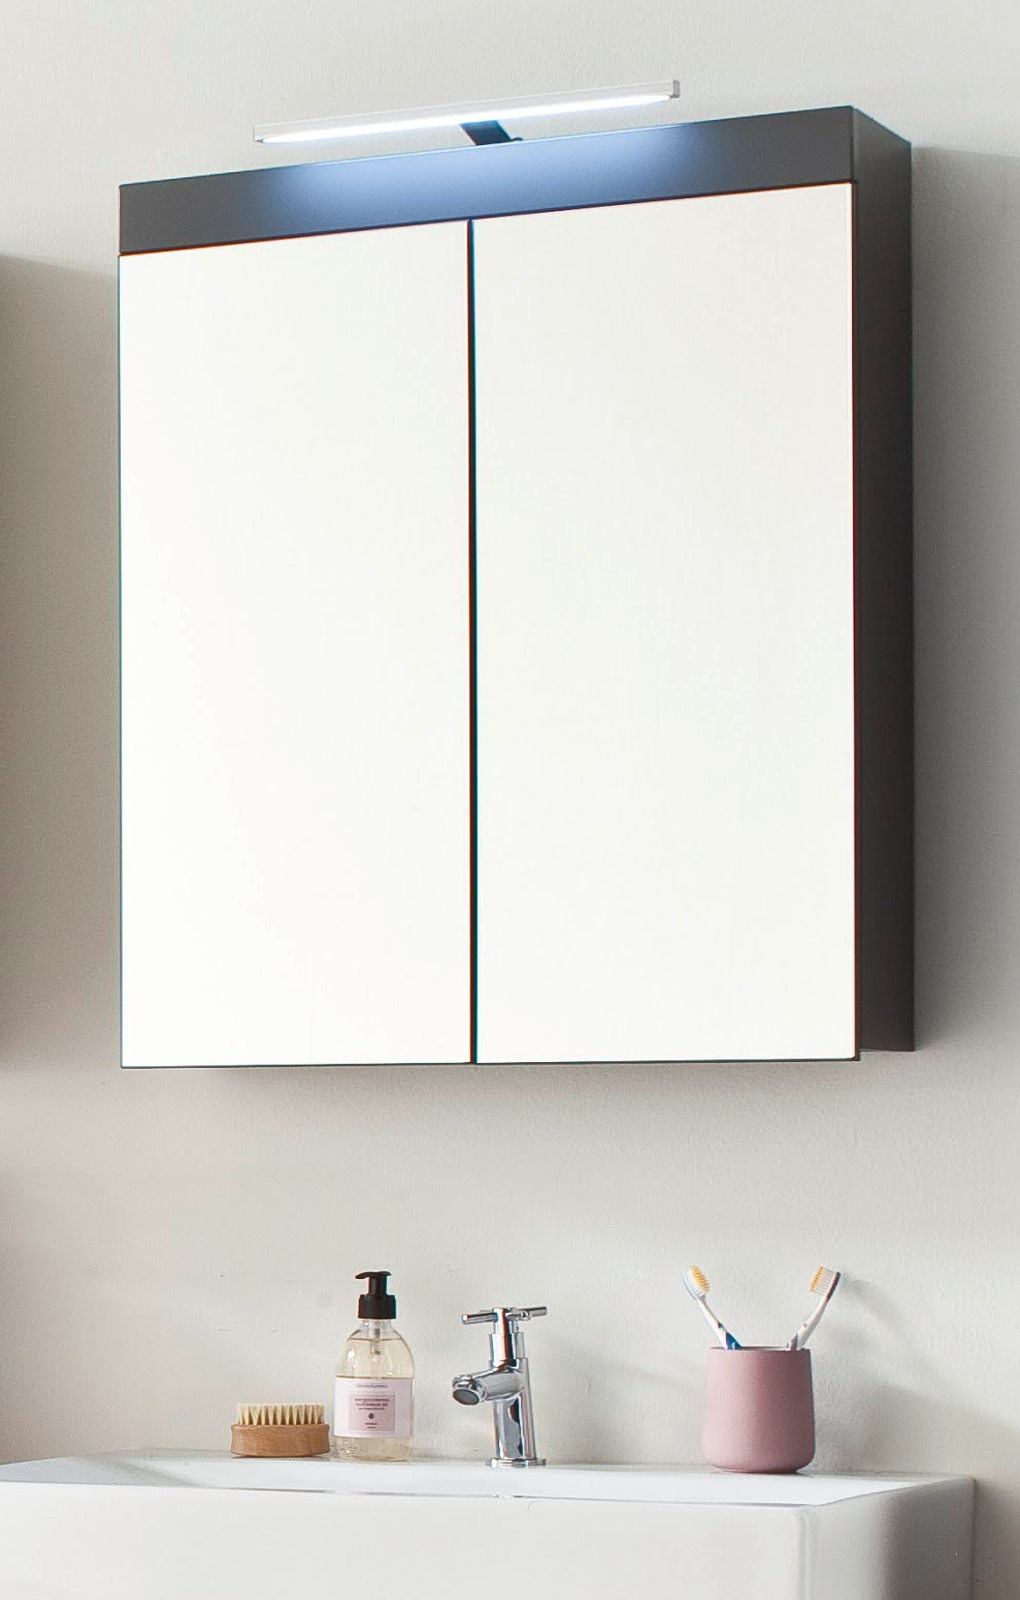 Spiegelschrank amanda hochglanz grau inkl led leuchte for Spiegelschrank grau